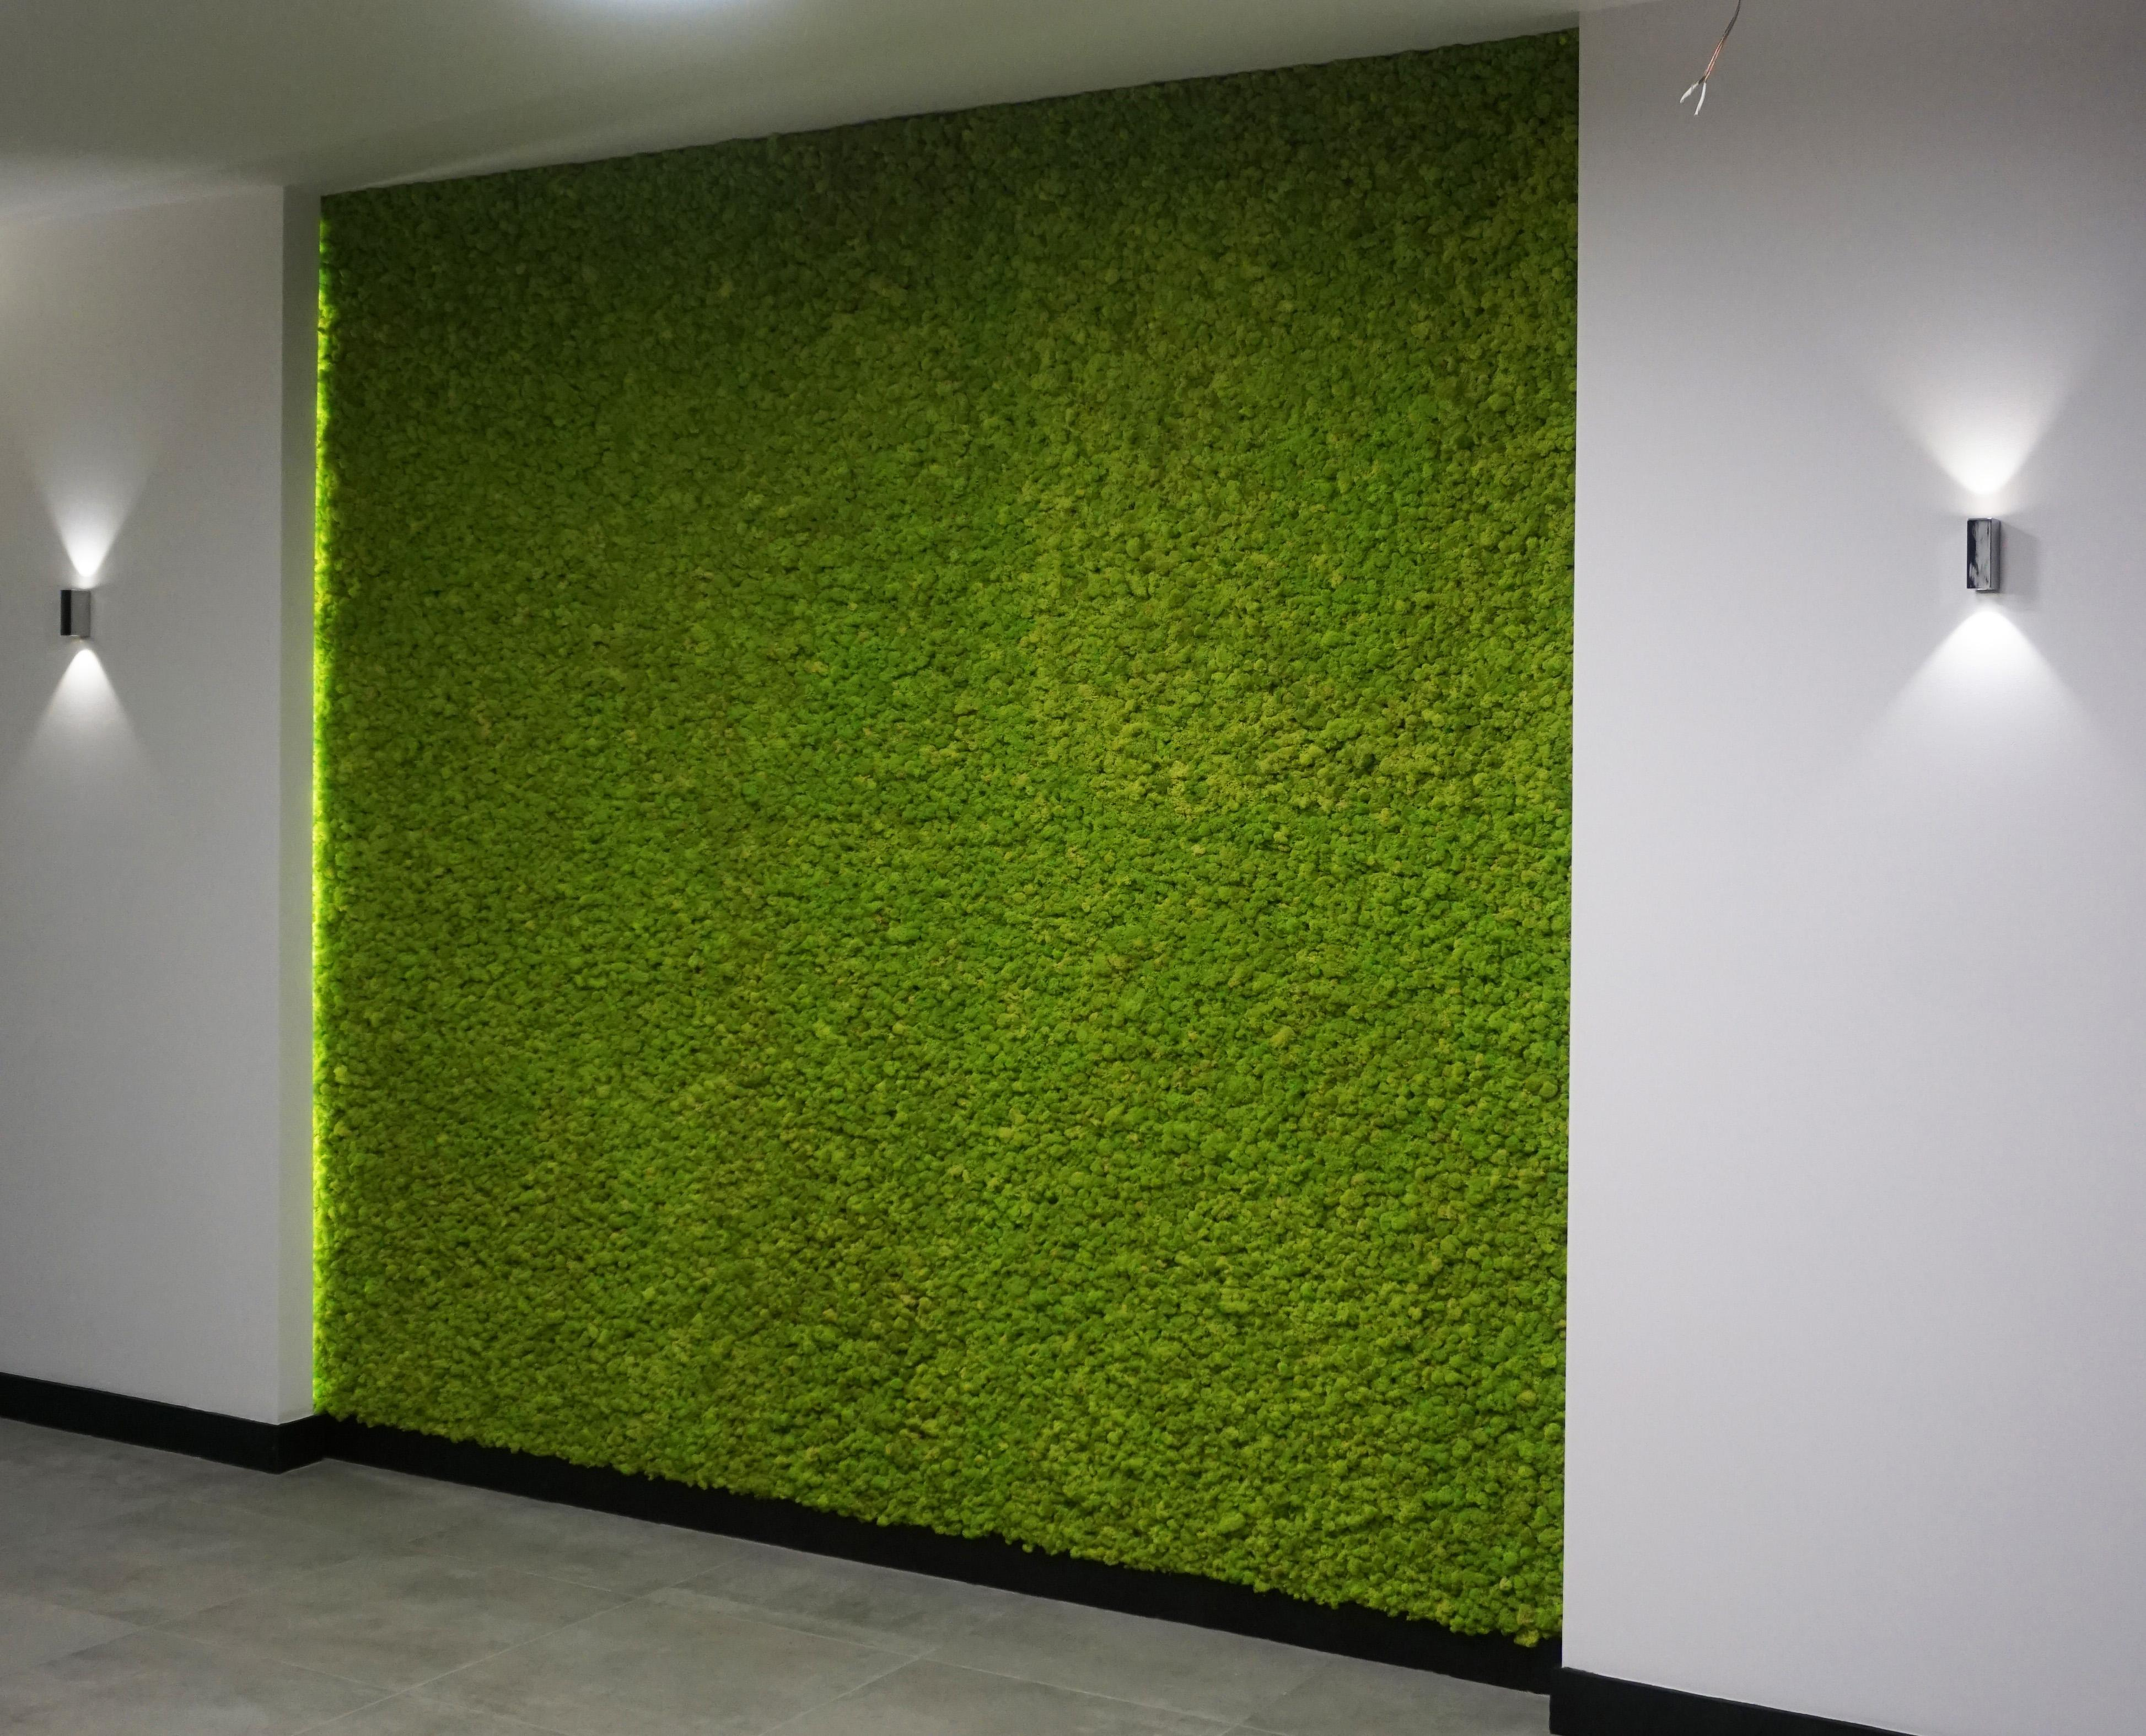 zielona sciana chrobotek